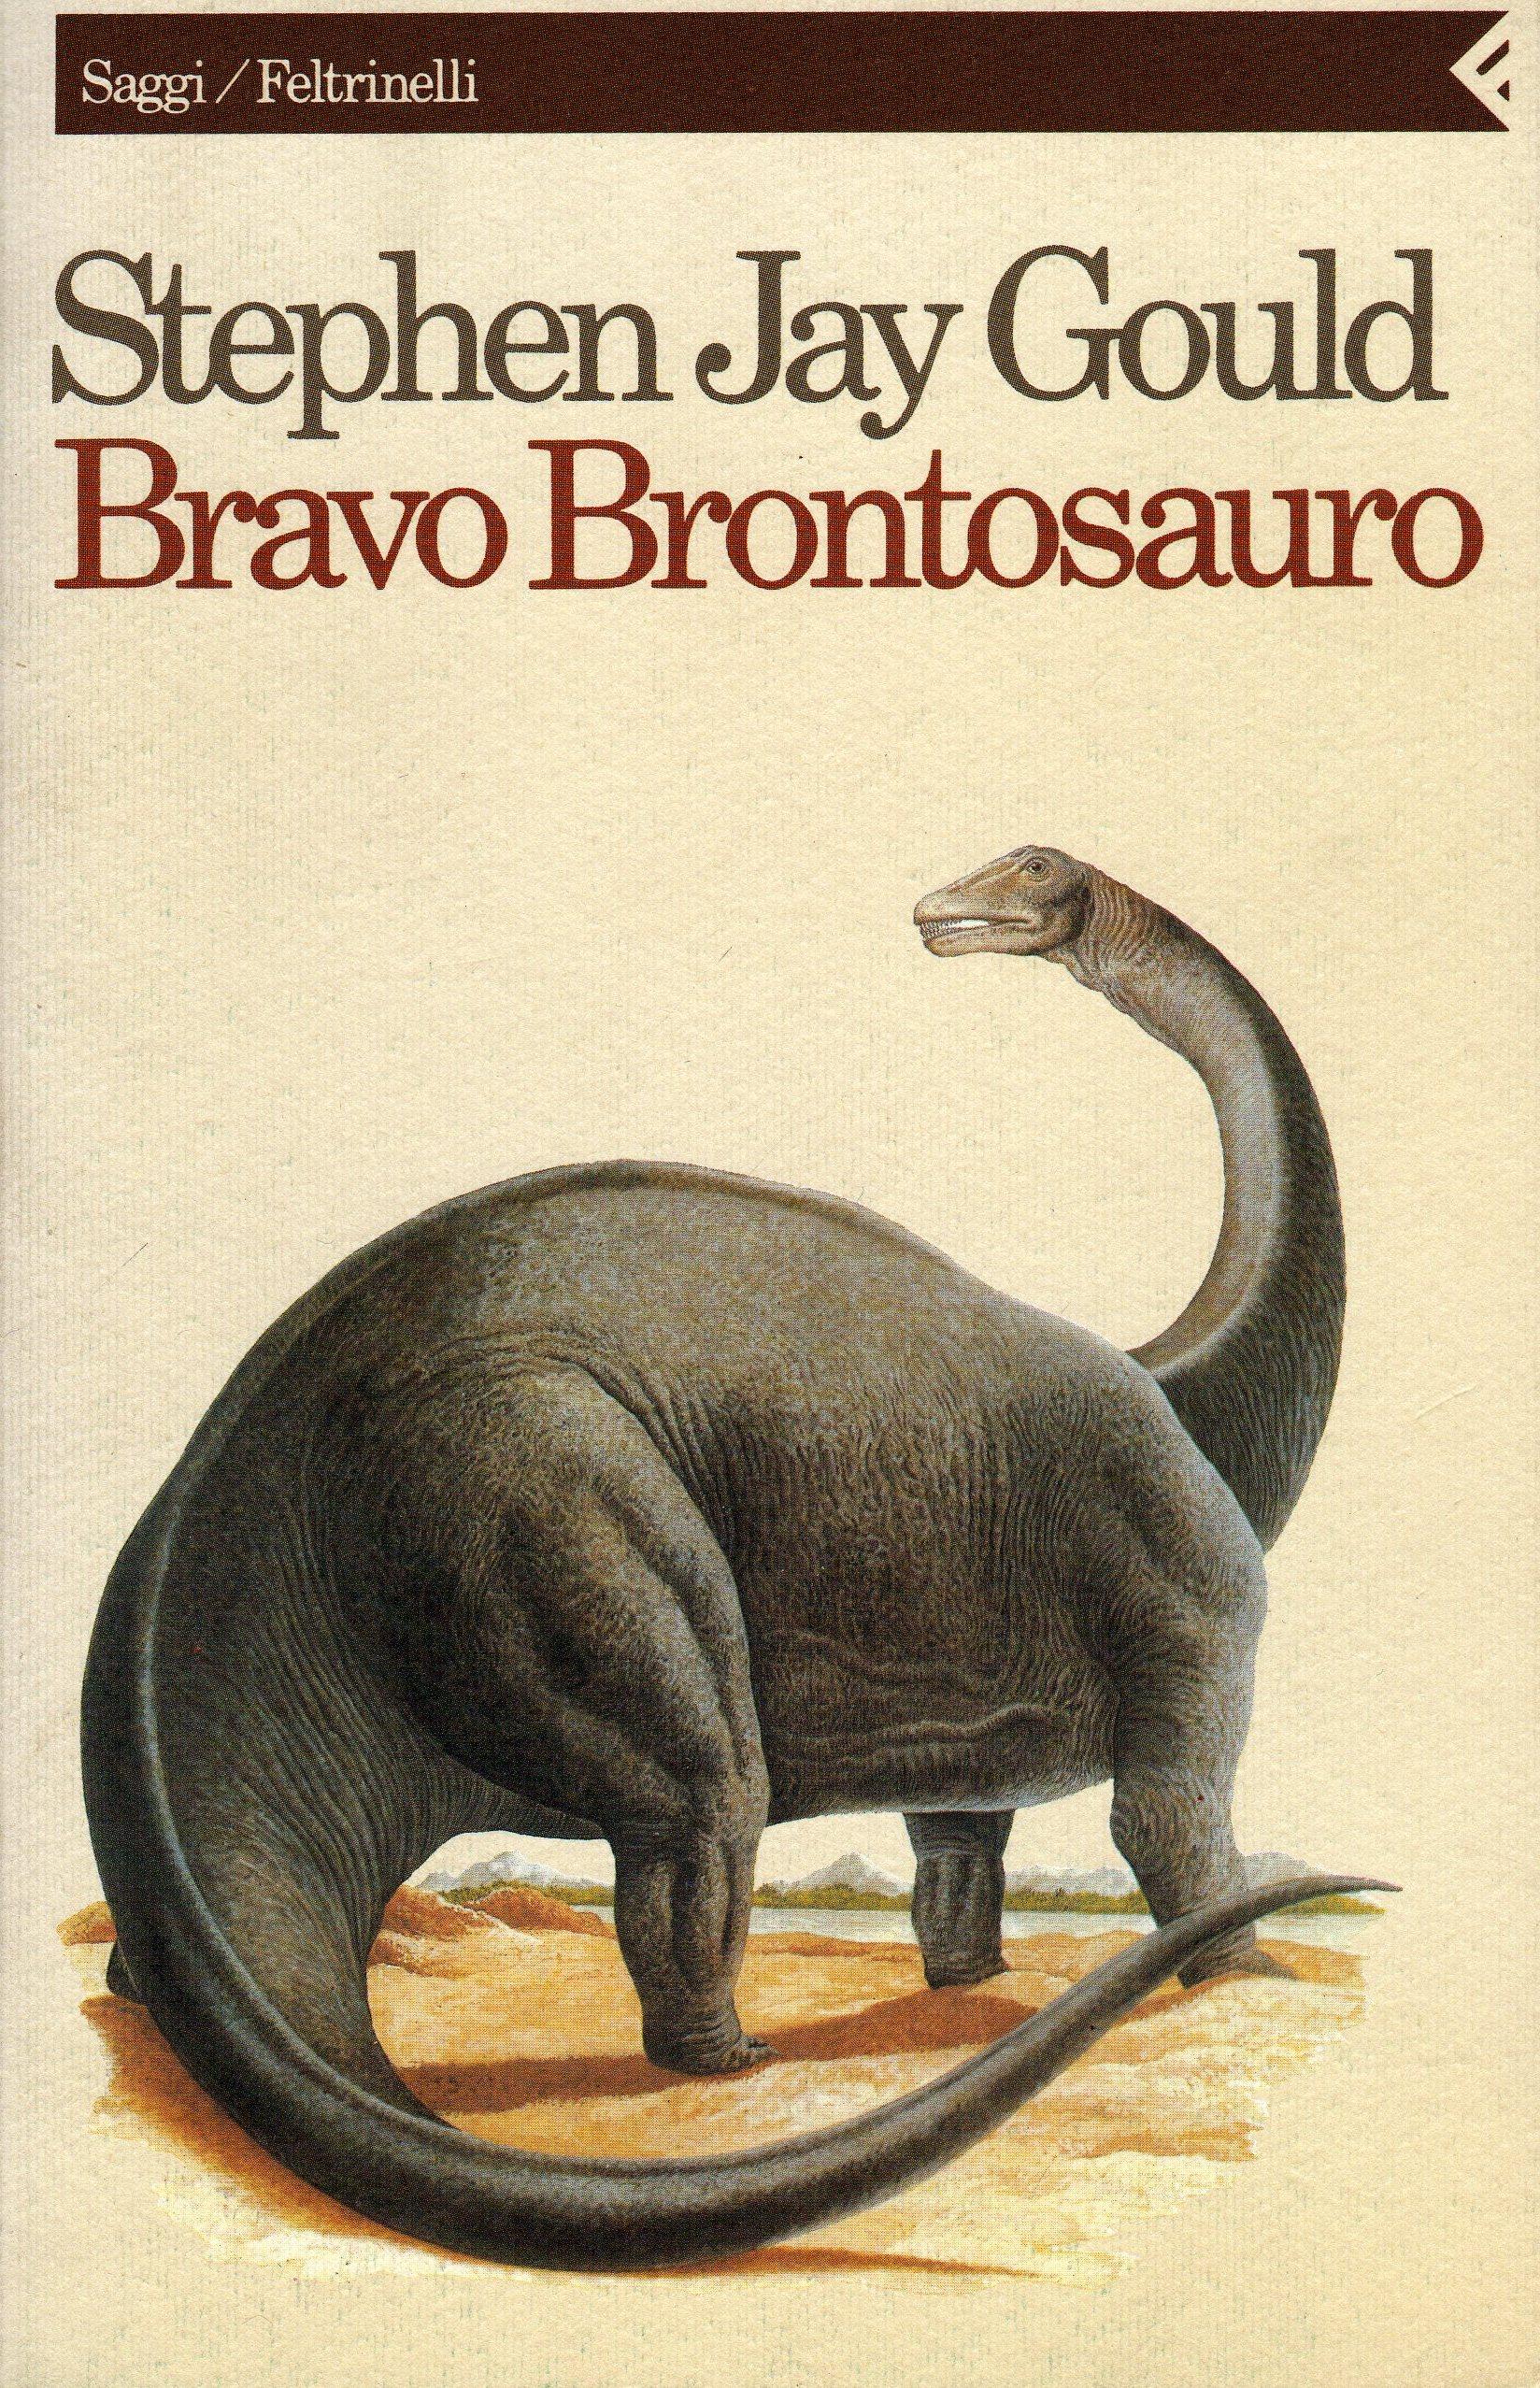 Bravo brontosauro